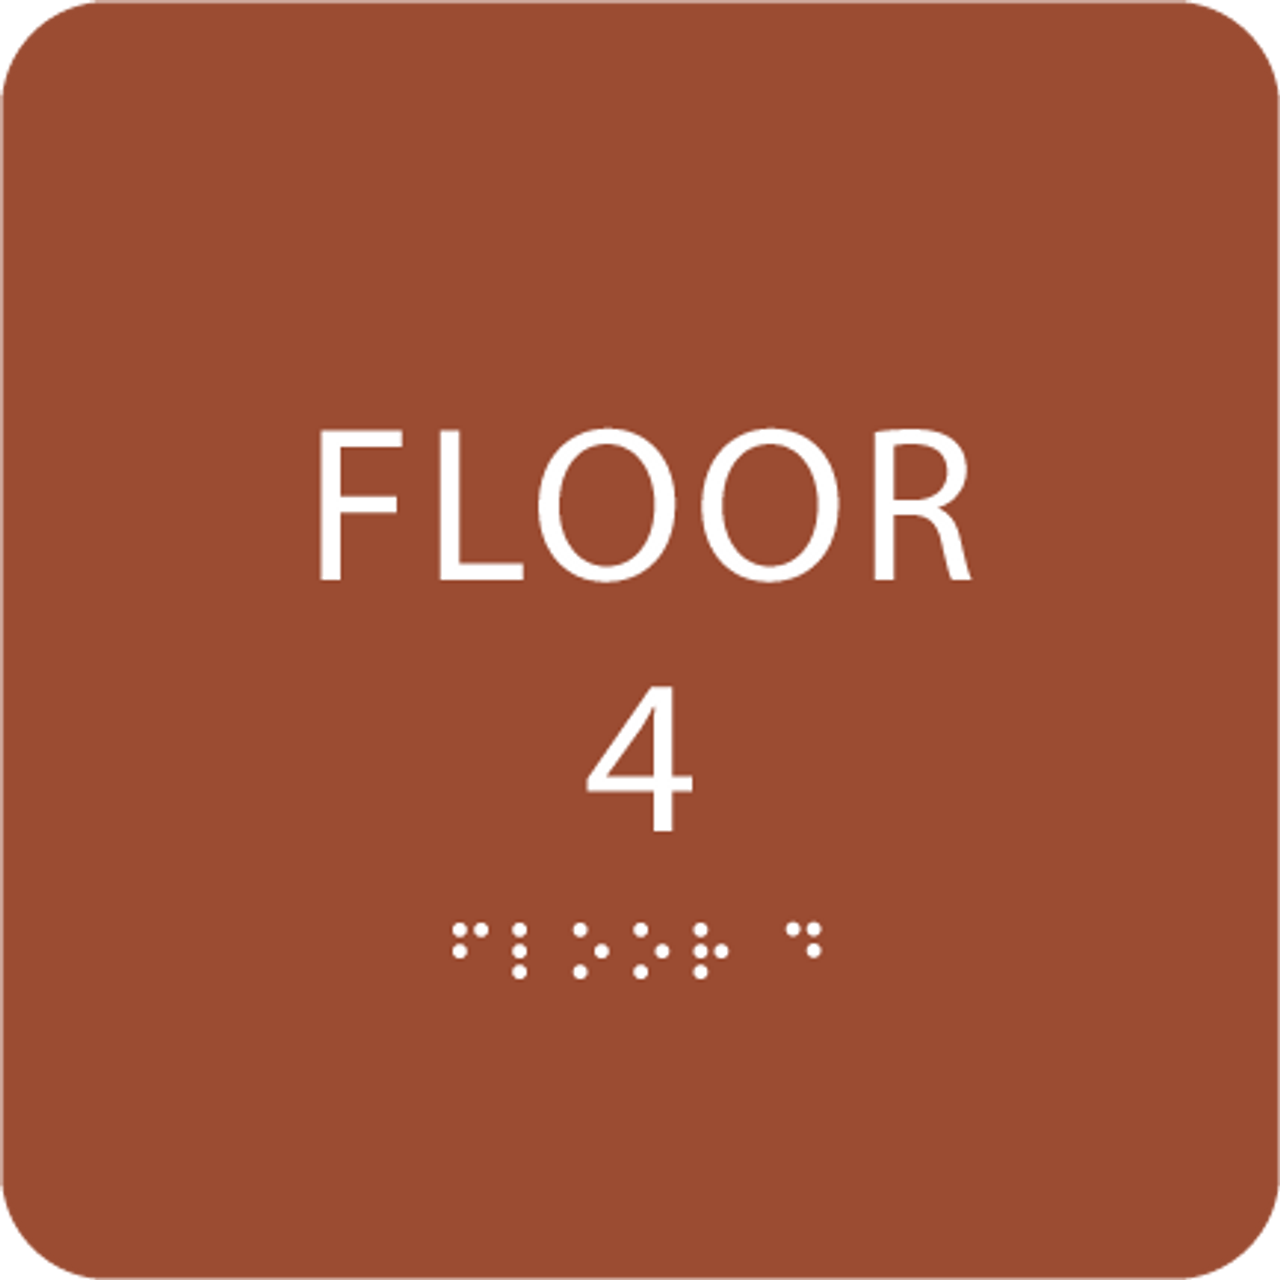 Orange Floor 4 Identification Sign